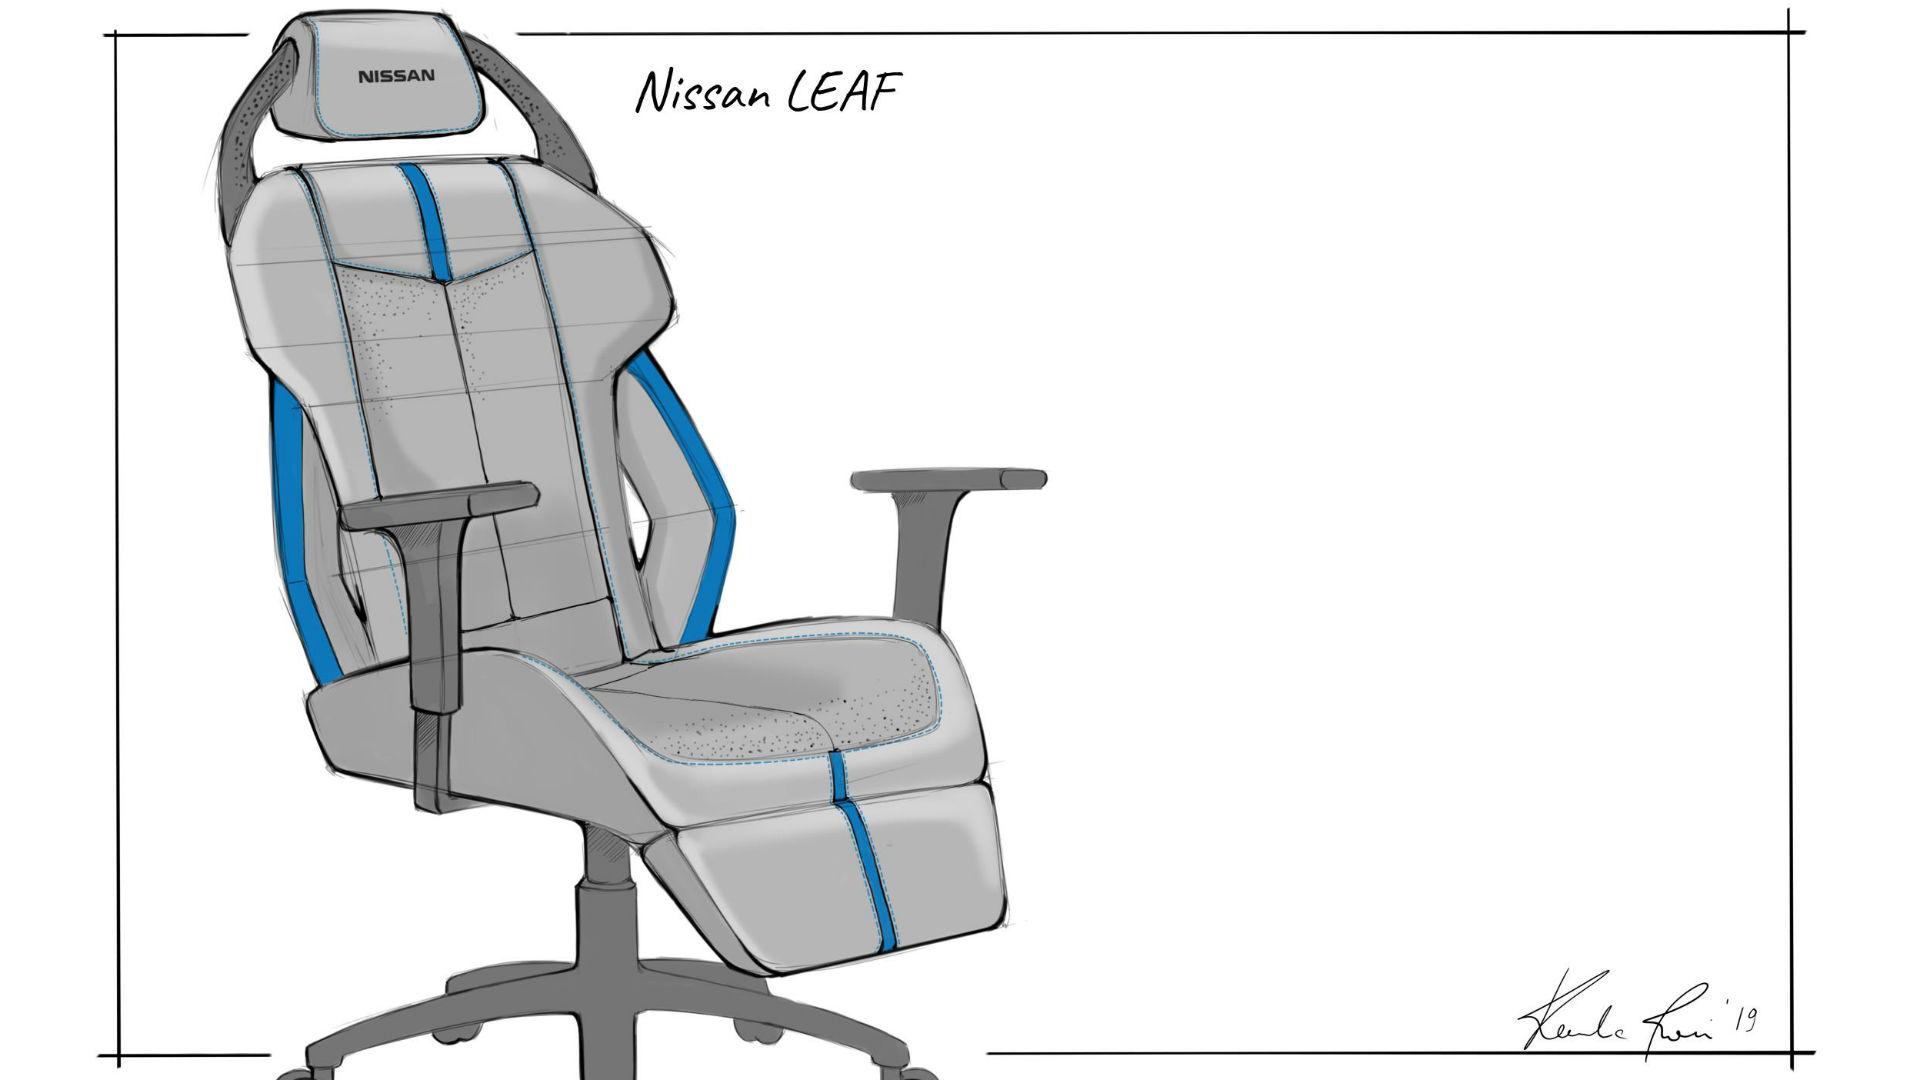 Nissan Leaf gaming chair